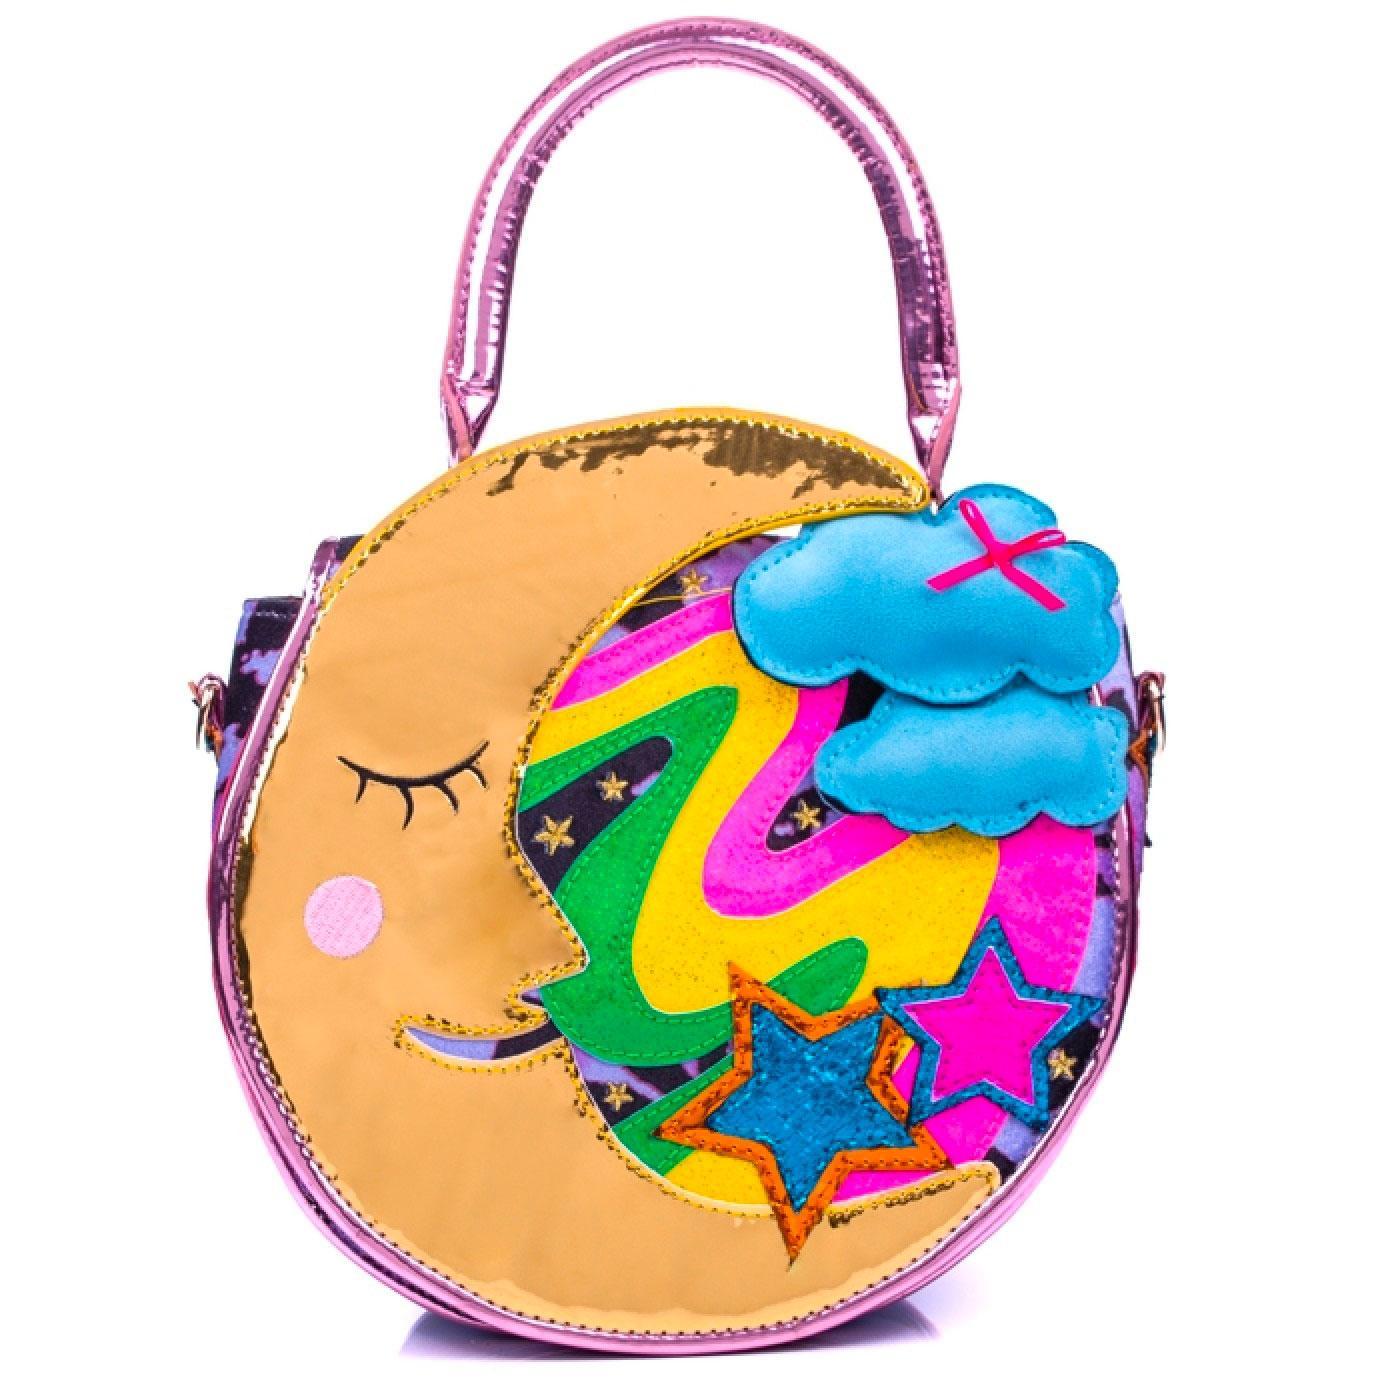 Astronaughty IRREGULAR CHOICE Moon Handbag